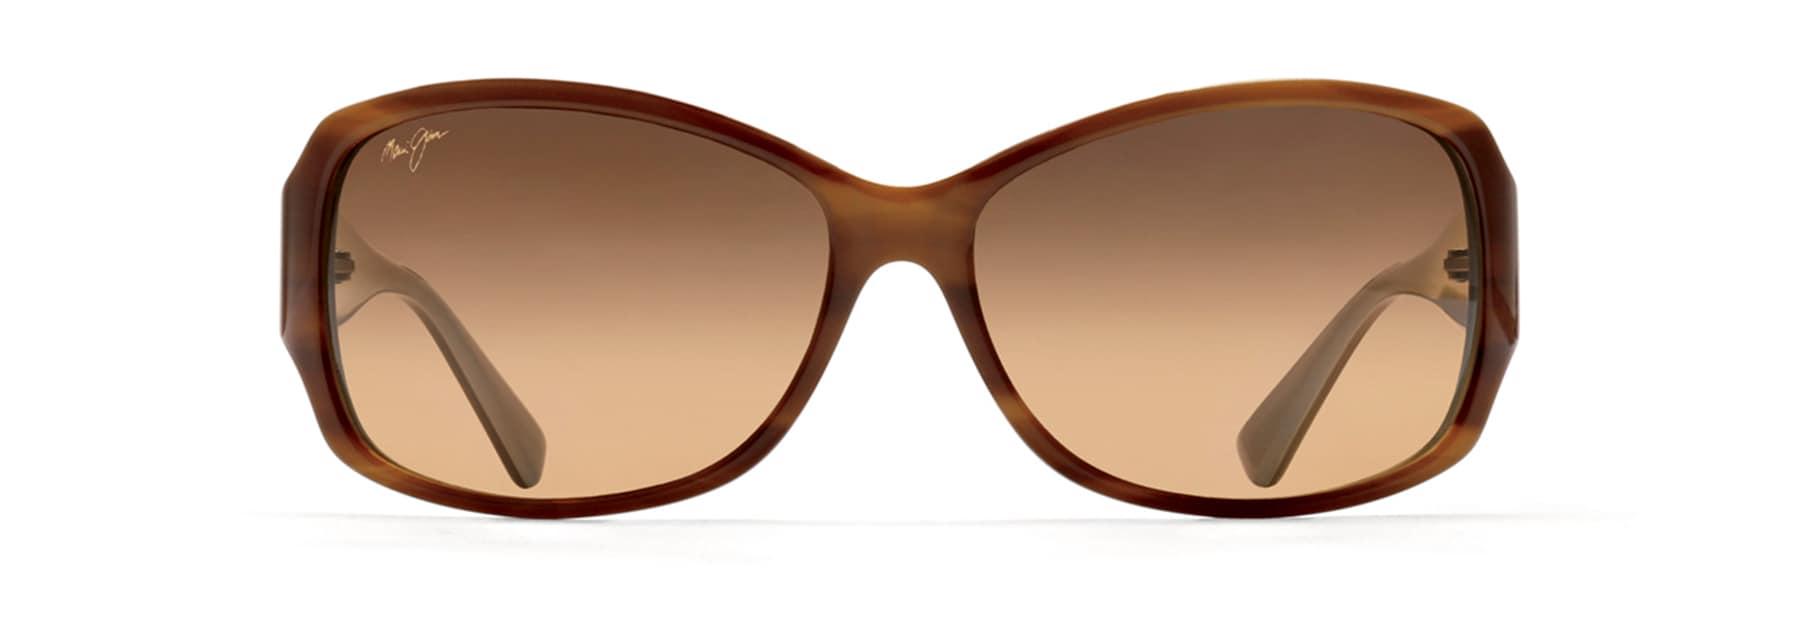 1ca37c712f0a Nalani Polarised Sunglasses